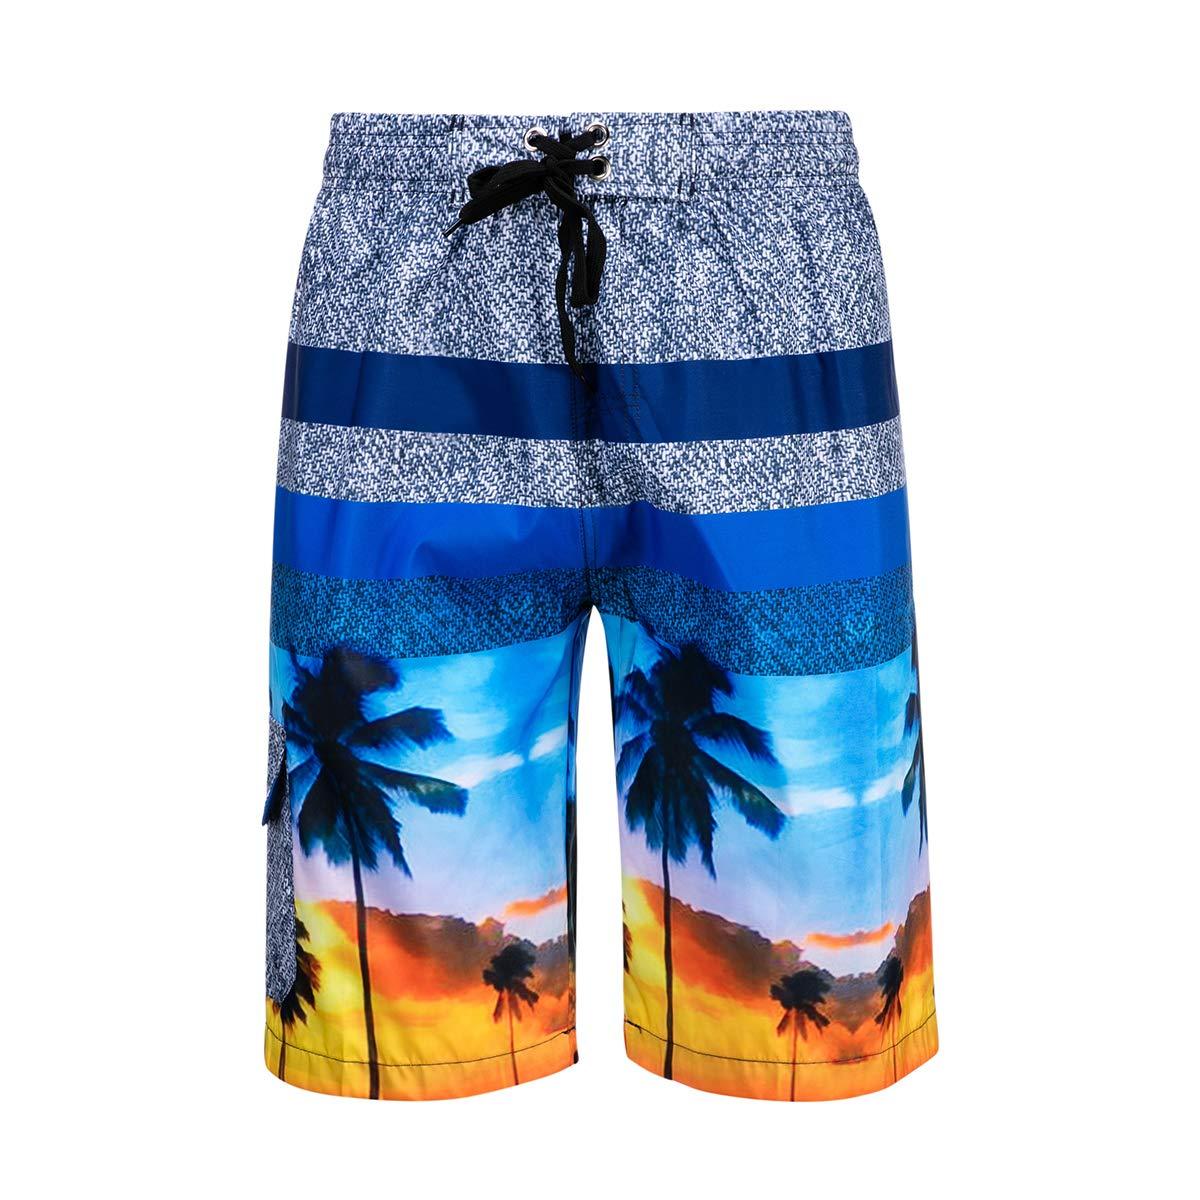 DRSLPAR Mens Quick Dry Swim Trunks Drawstring Beach Shorts Swim Shorts with Mesh Lining M